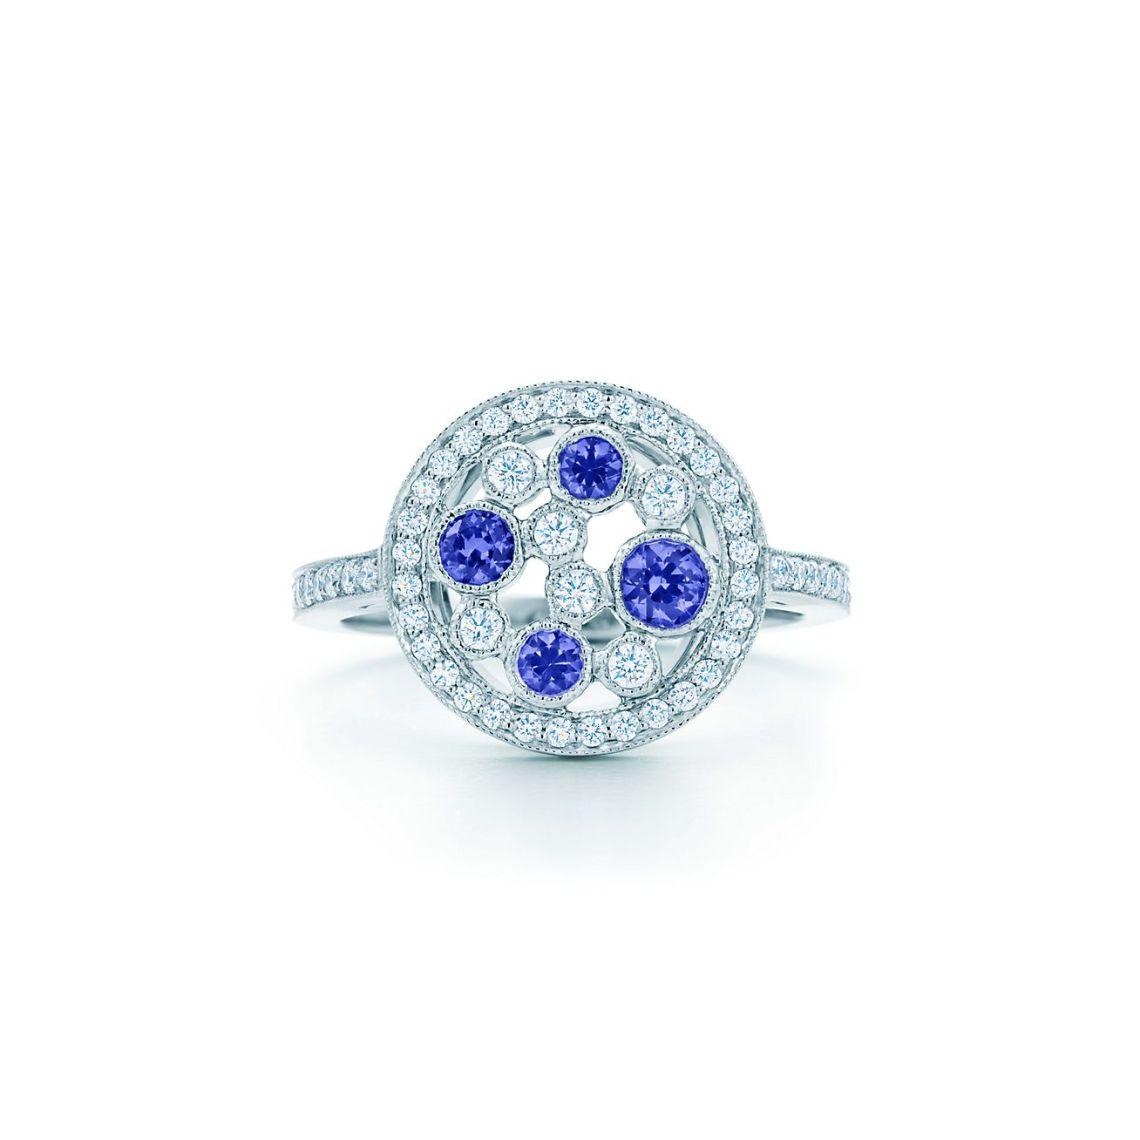 Image Result For En Ement Ring Stores Canada